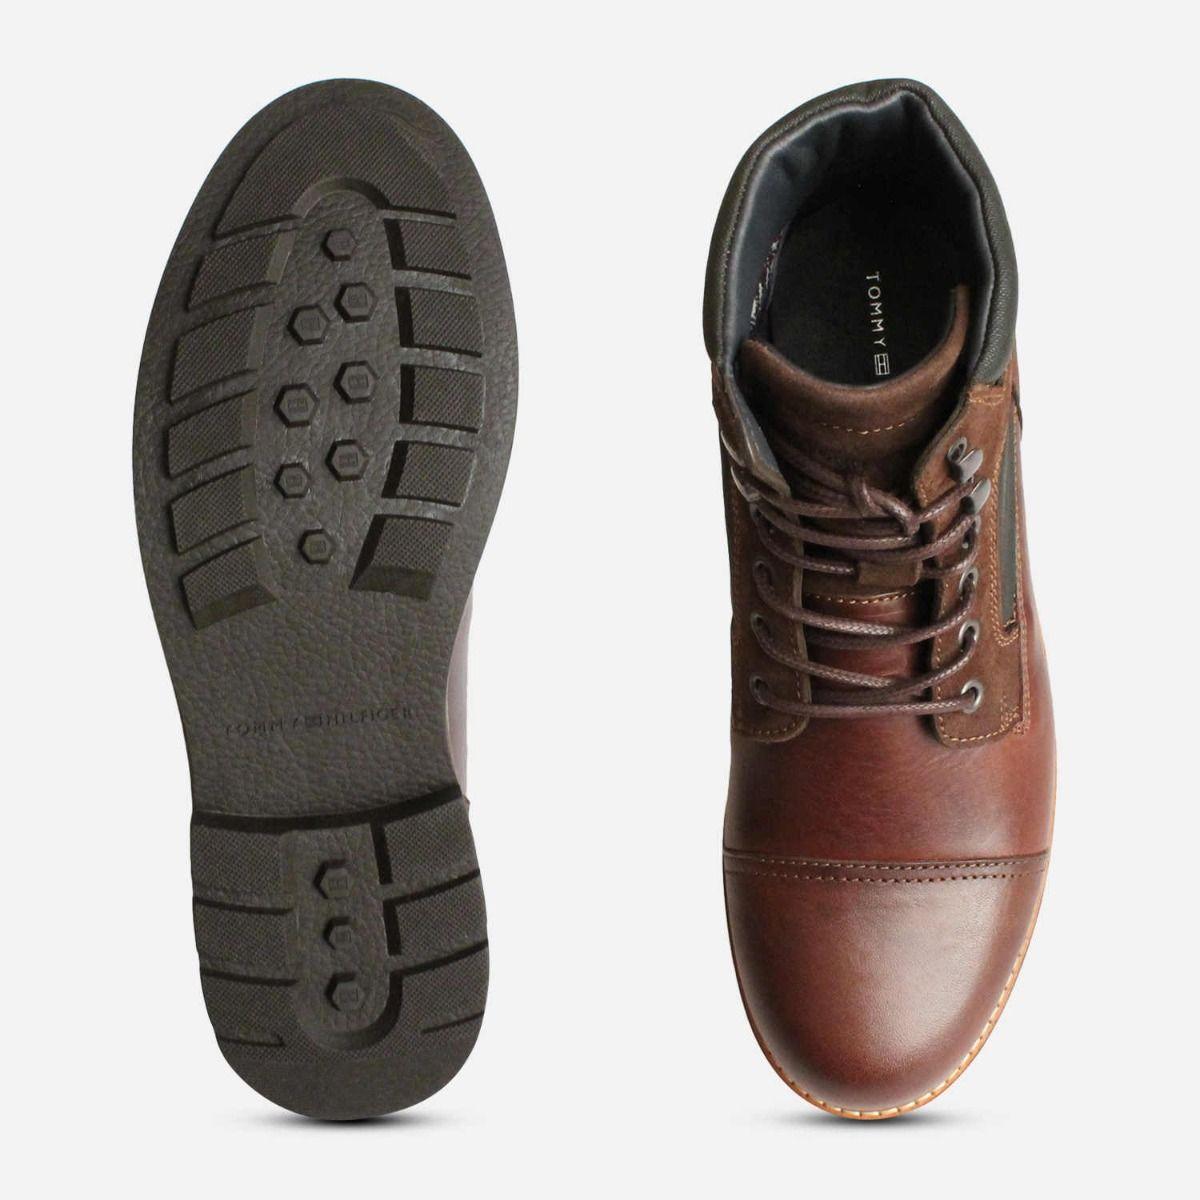 Tommy Hilfiger Coffee Brown Leather Urban Trekking Boot